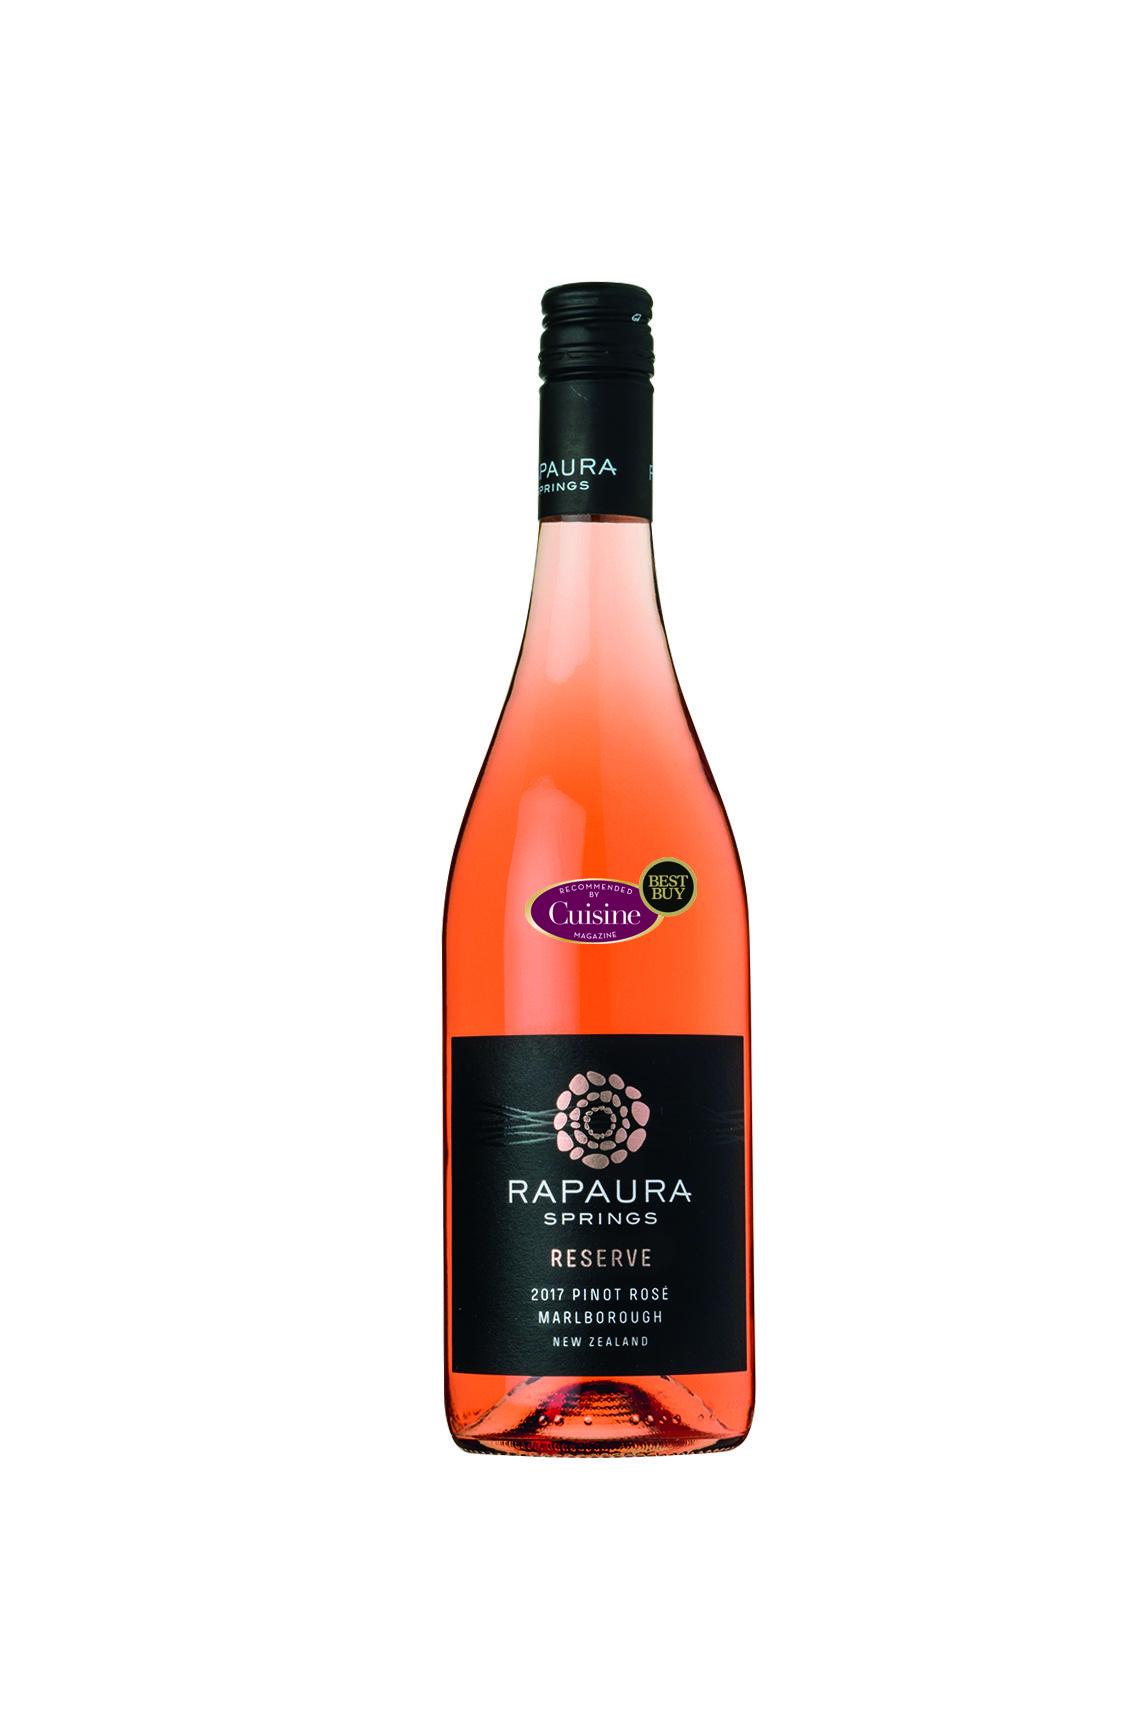 Rapaura Springs Reserve Marlborough Pinot Rosé 2017